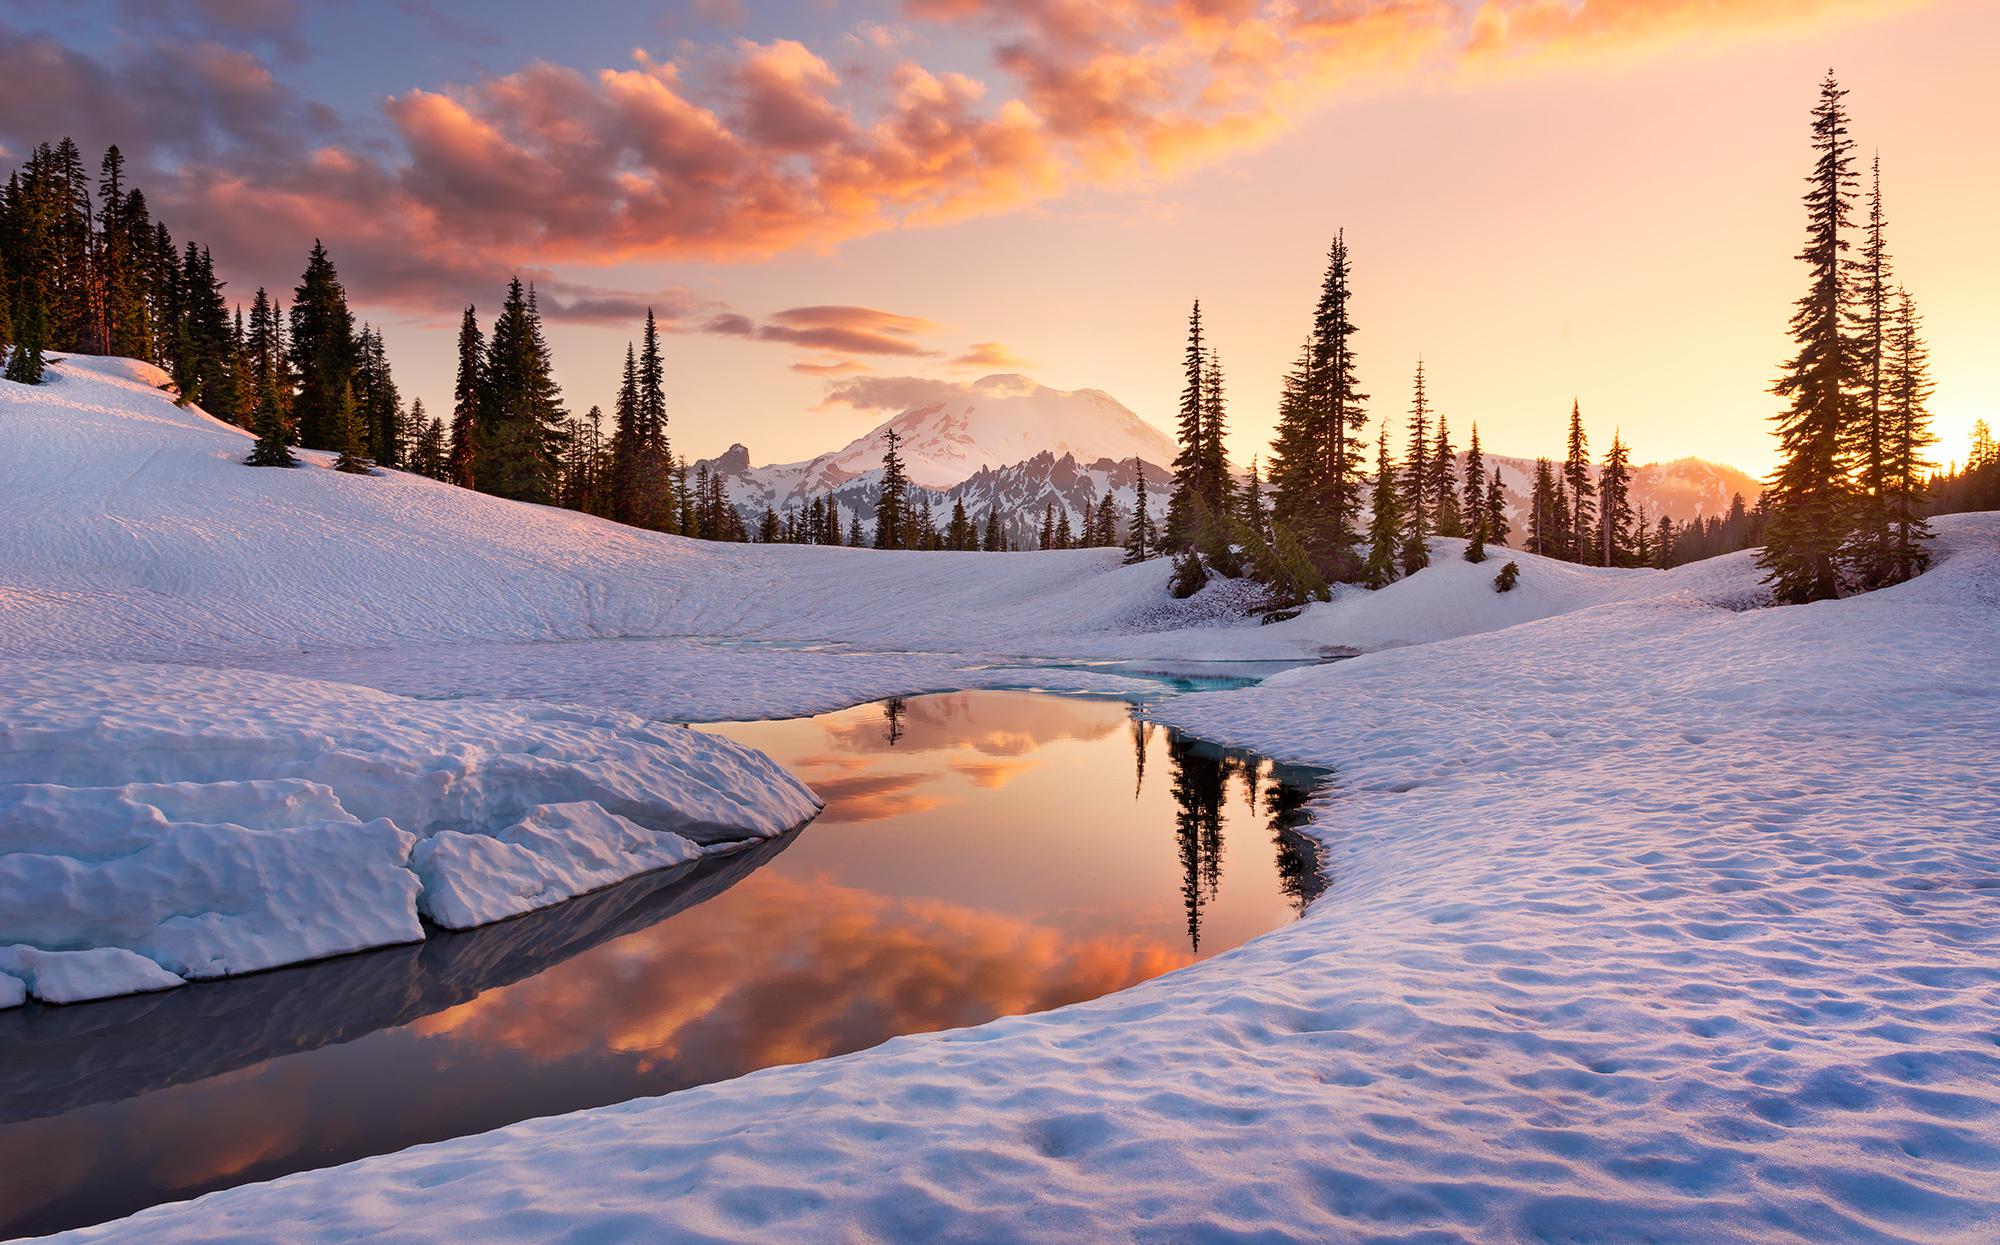 Stefan Hefele Edition 2 Fotobehang Komar - Natuur behang AMERICA THE BEAUTIFUL